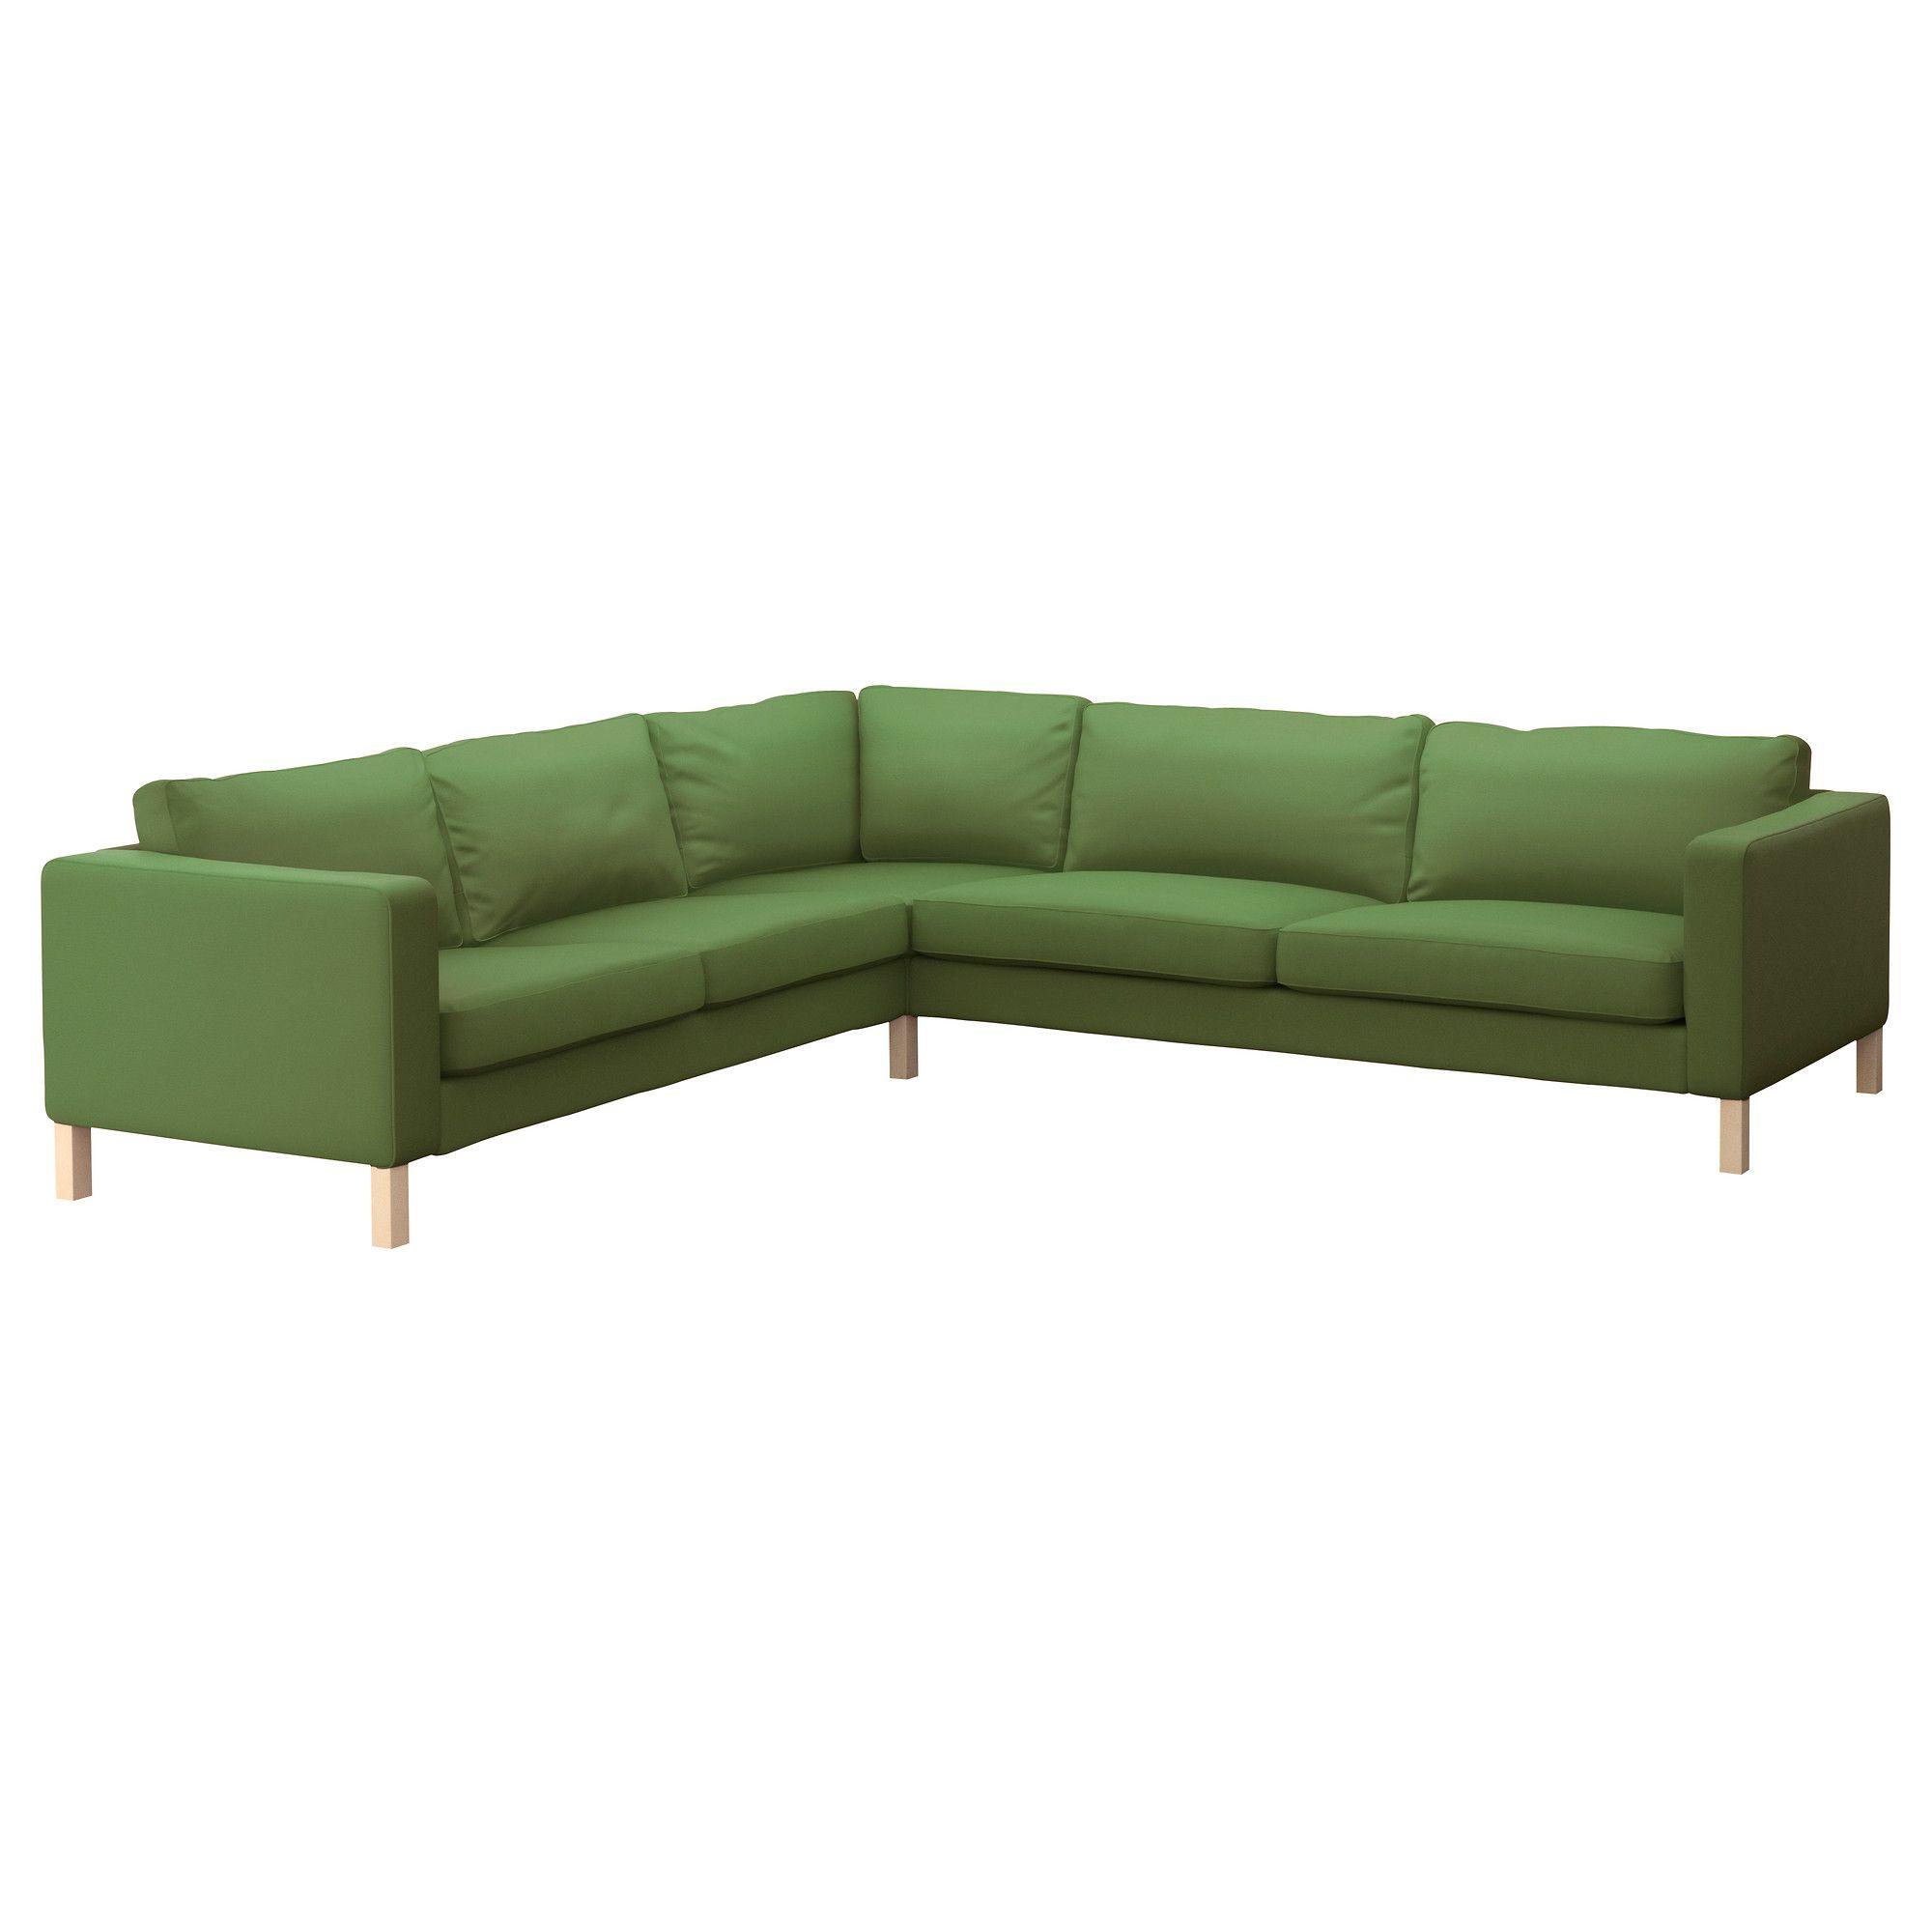 Ikea Us Furniture And Home Furnishings Living Room Furniture Sofas Green Corner Sofas Corner Sofa